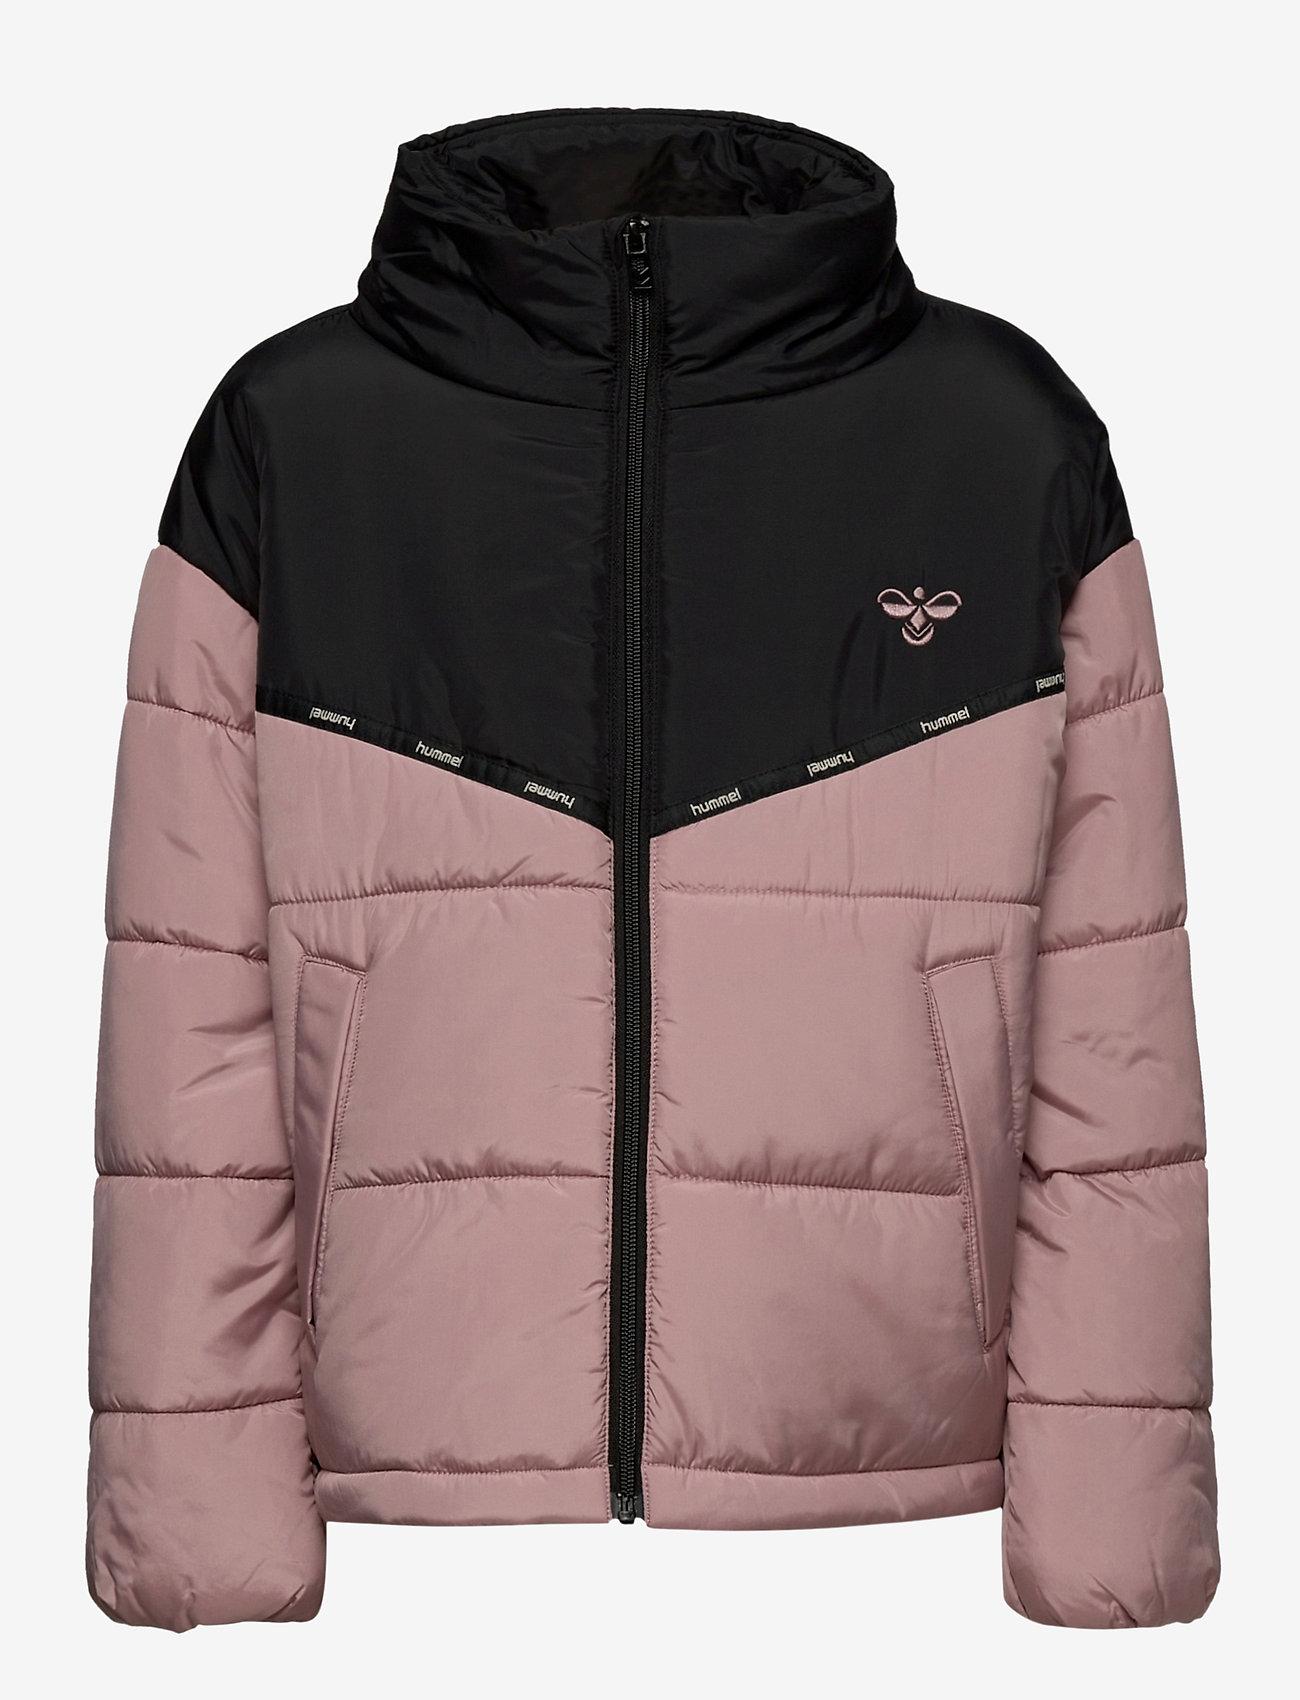 Hummel - hmlVIBRANT JACKET - insulated jackets - deauville mauve - 1